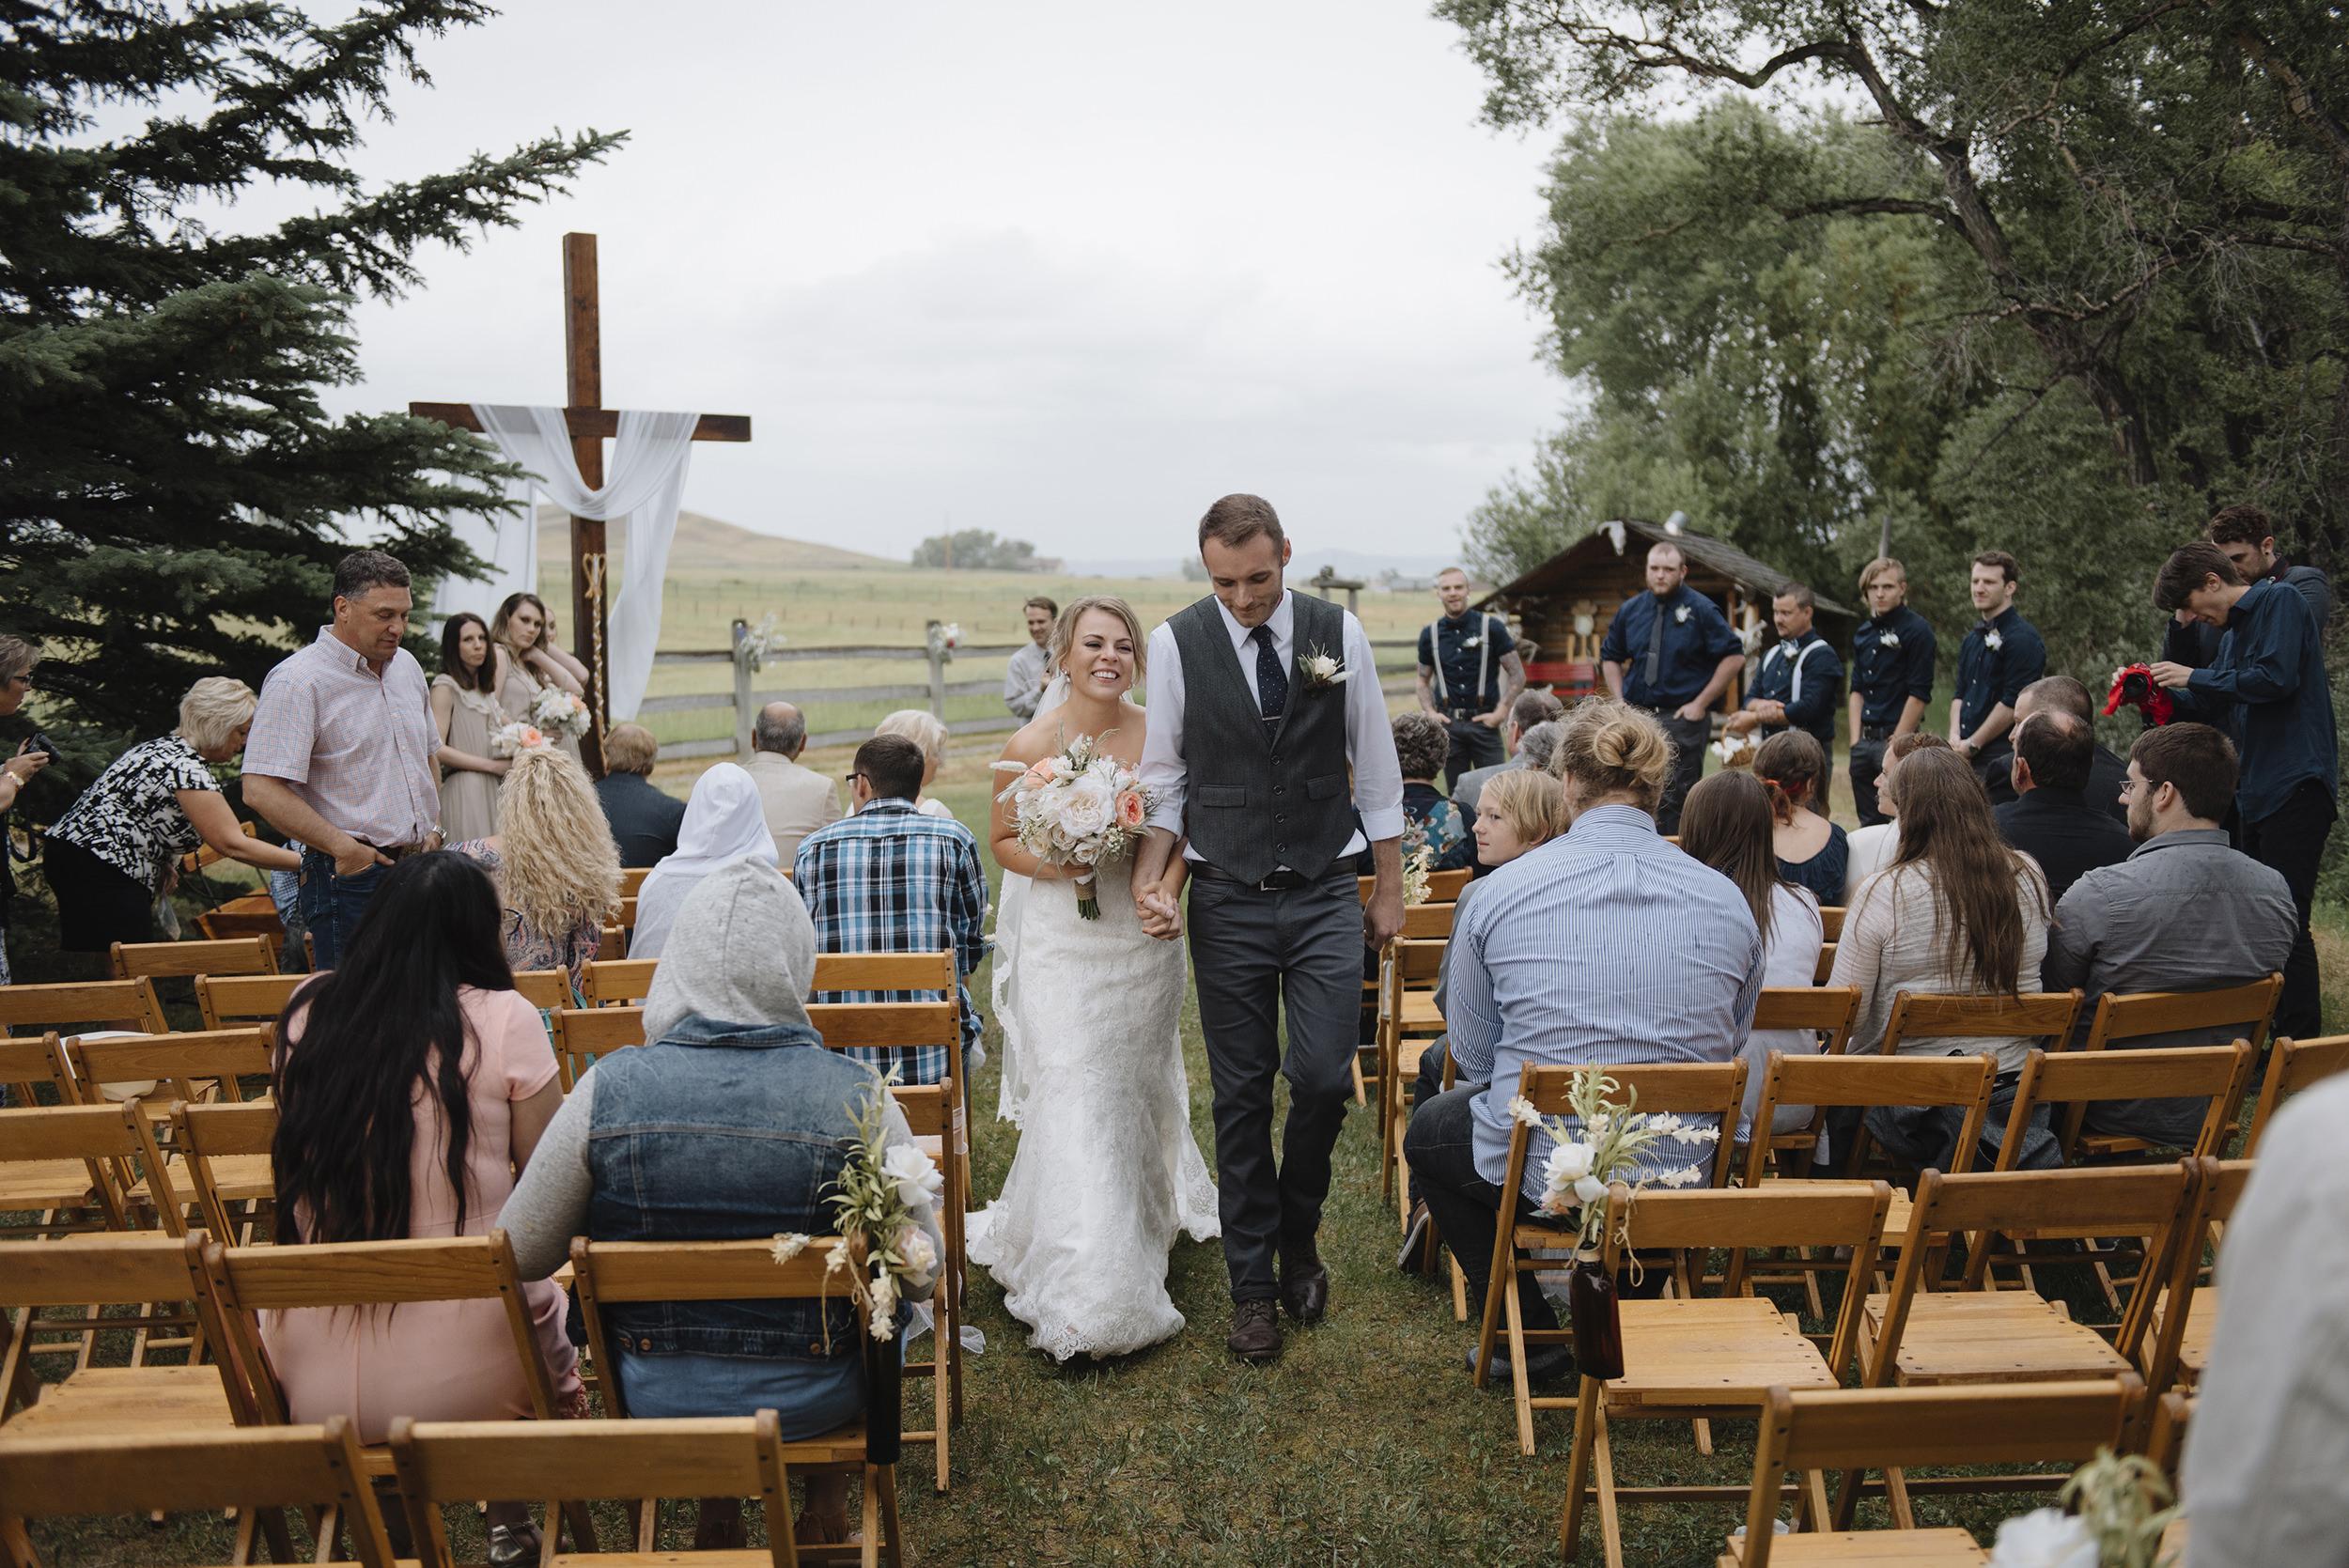 Colby-and-Jess-Intimate-Backyard-Wedding-Bozeman-Montana409.jpg